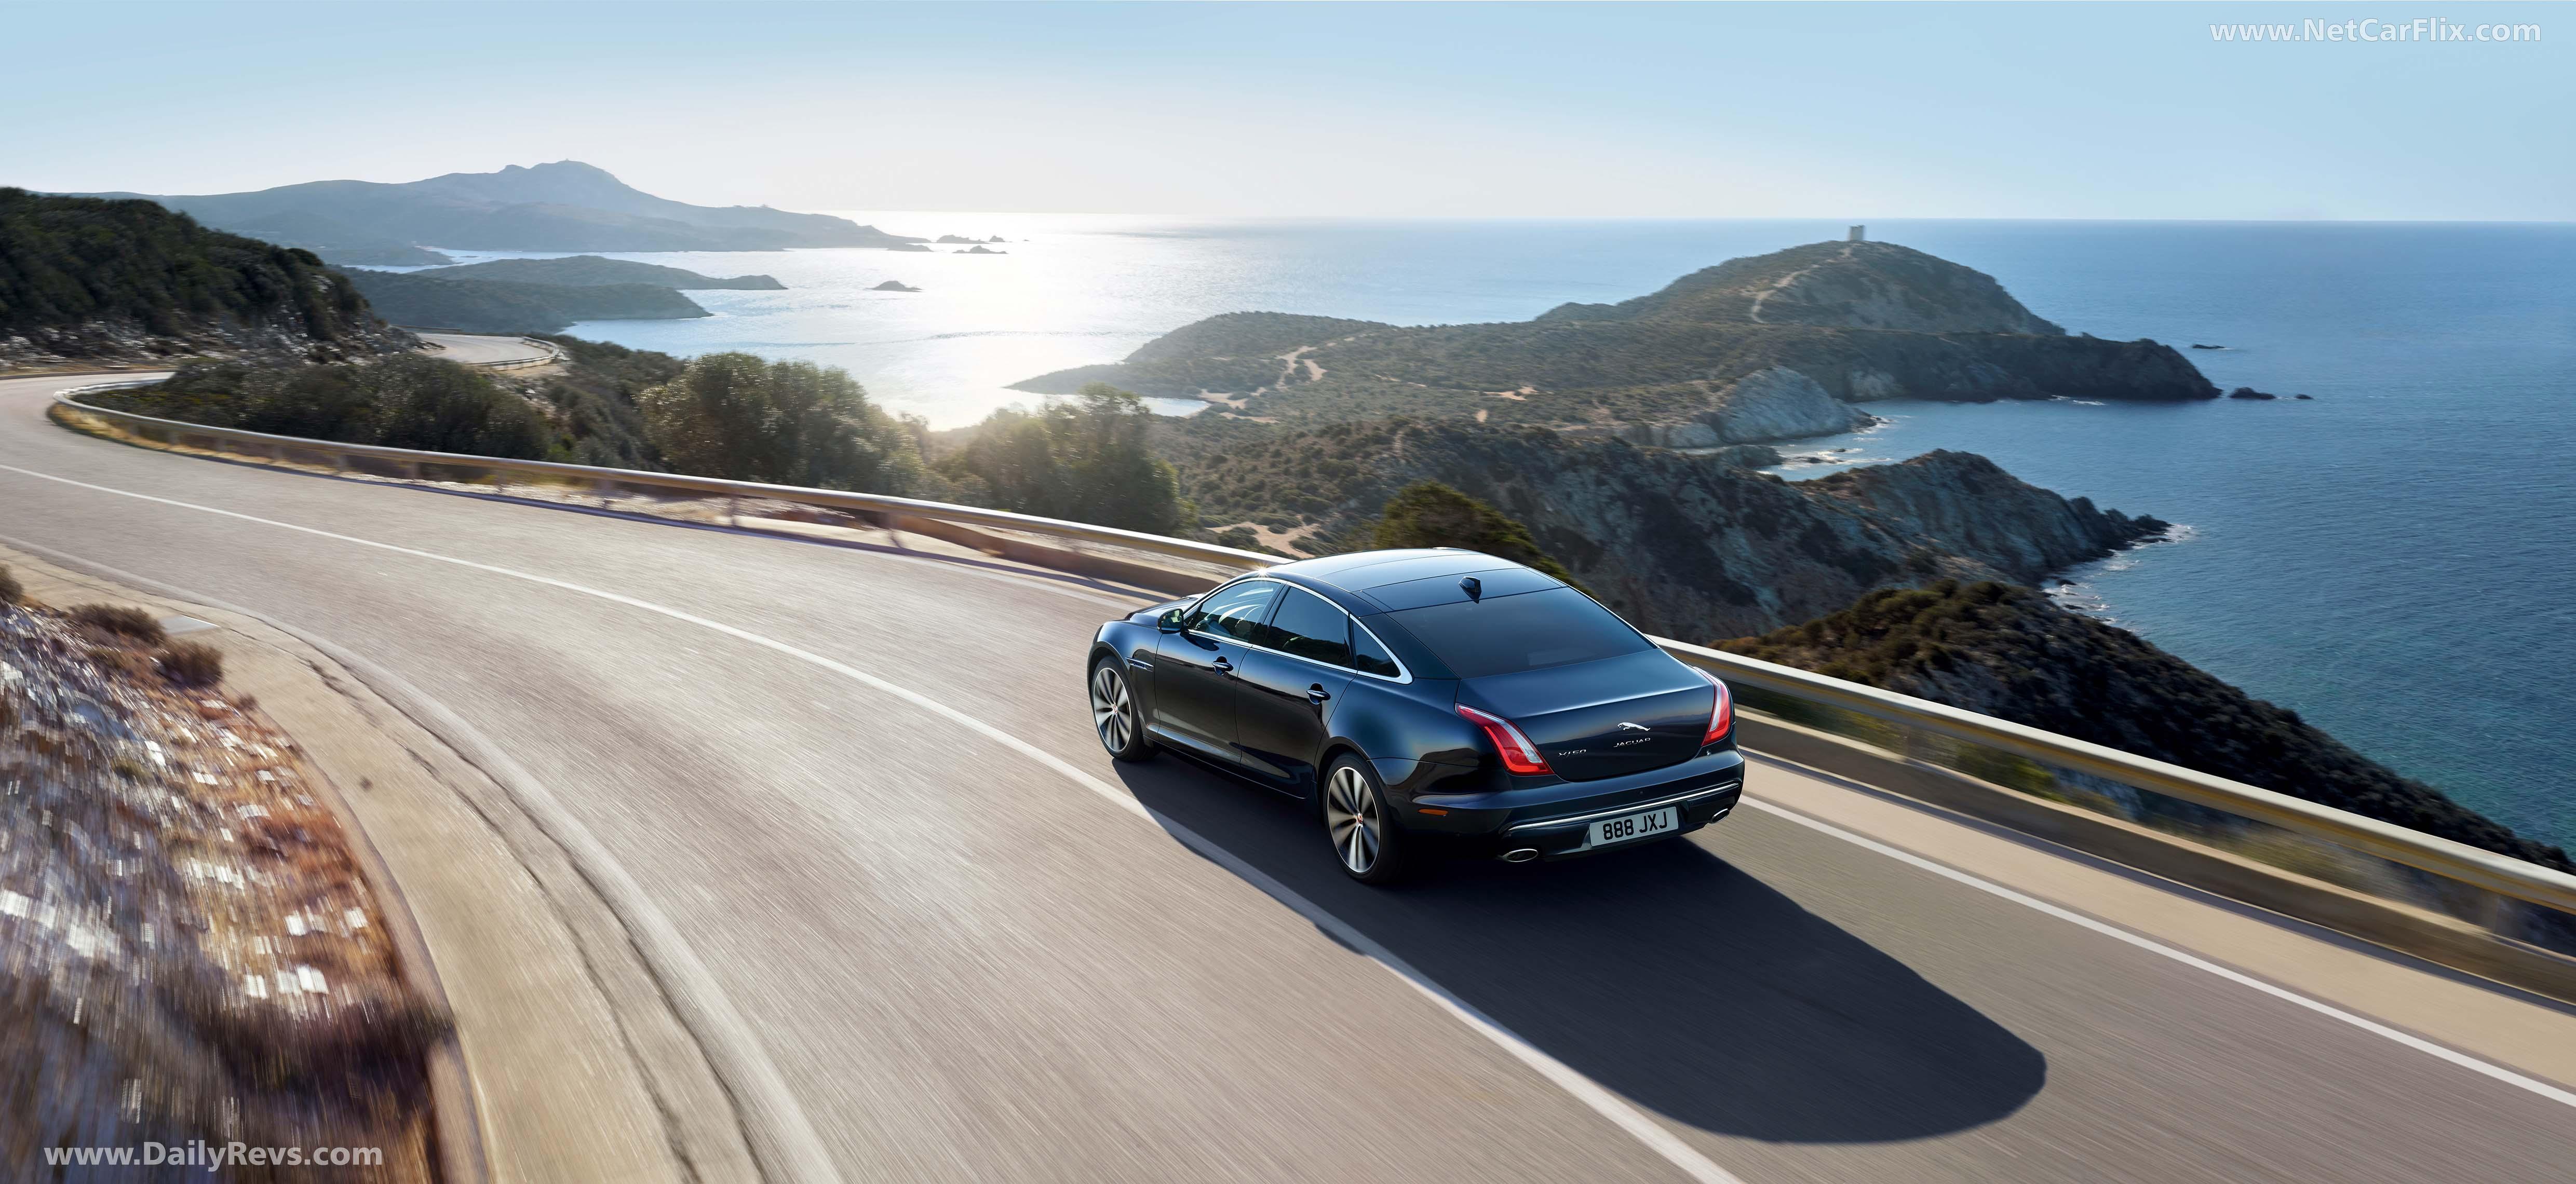 2019 Jaguar XJ50 - HD Pictures, Specs, information and ...